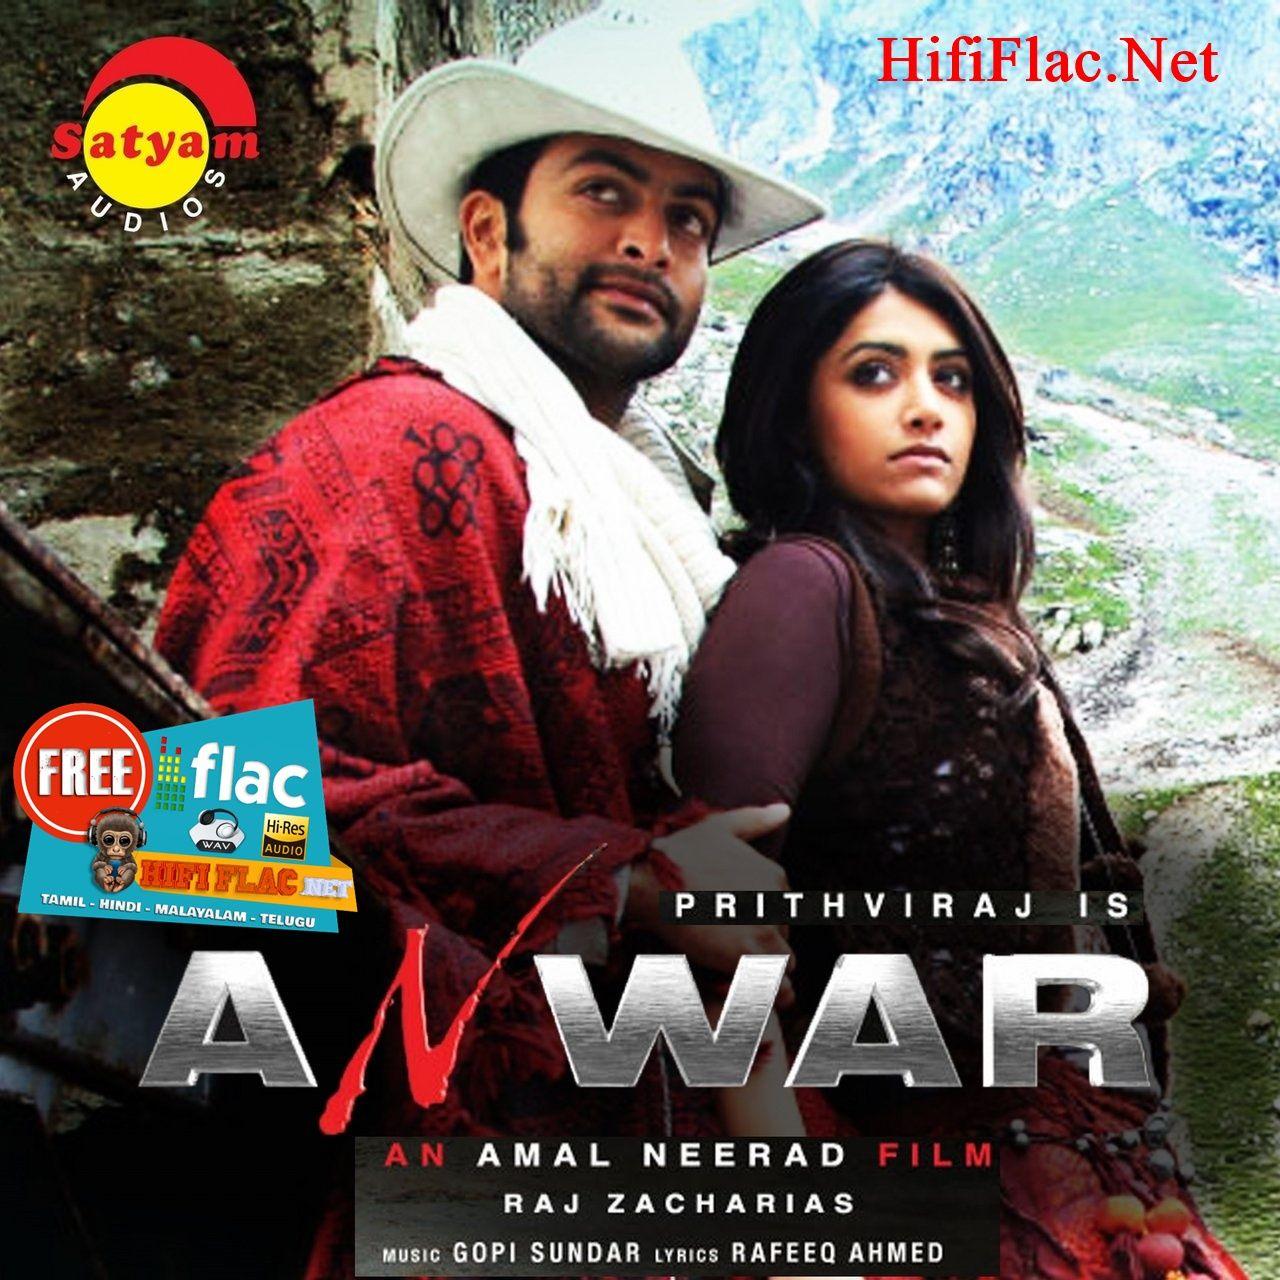 Anwar 2010 Malayalam Digitalrip Flac Film Music Movies